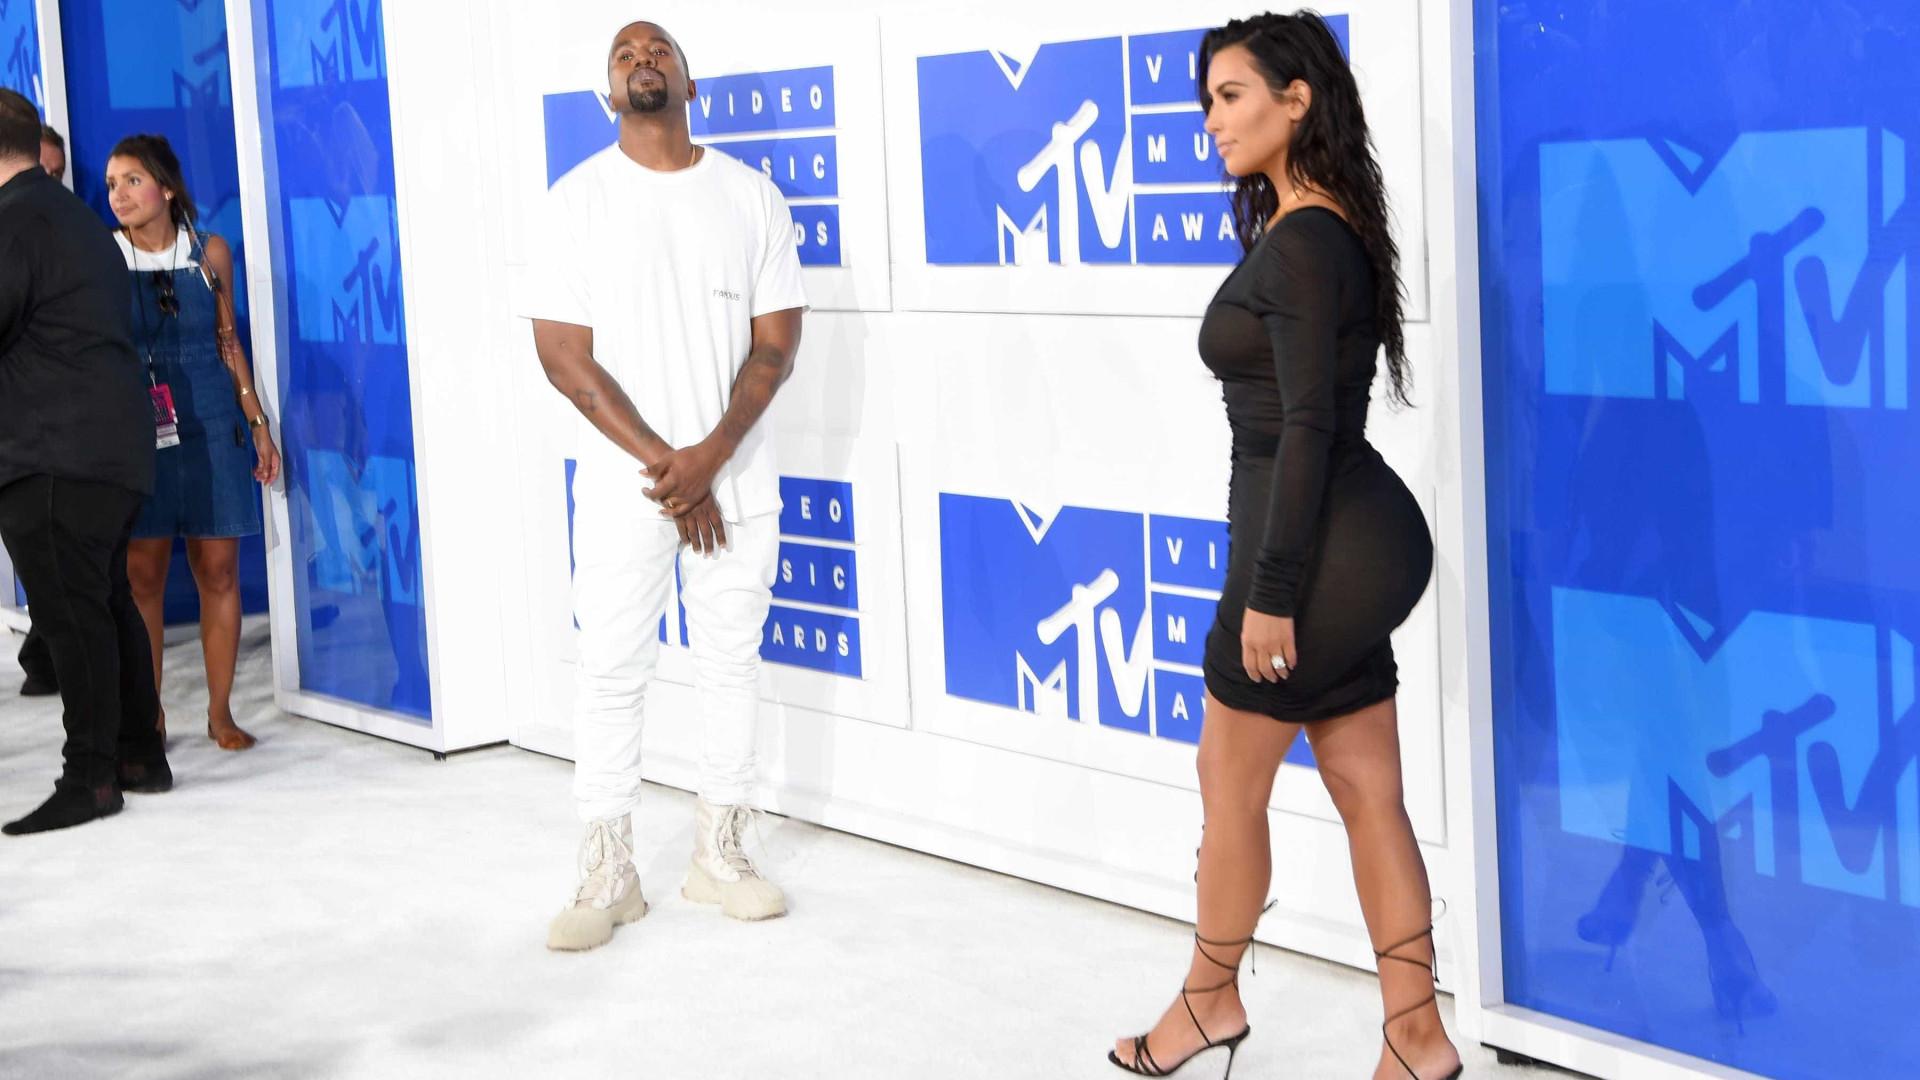 Kim Kardashian confirma que está a tentar engravidar pela terceira vez